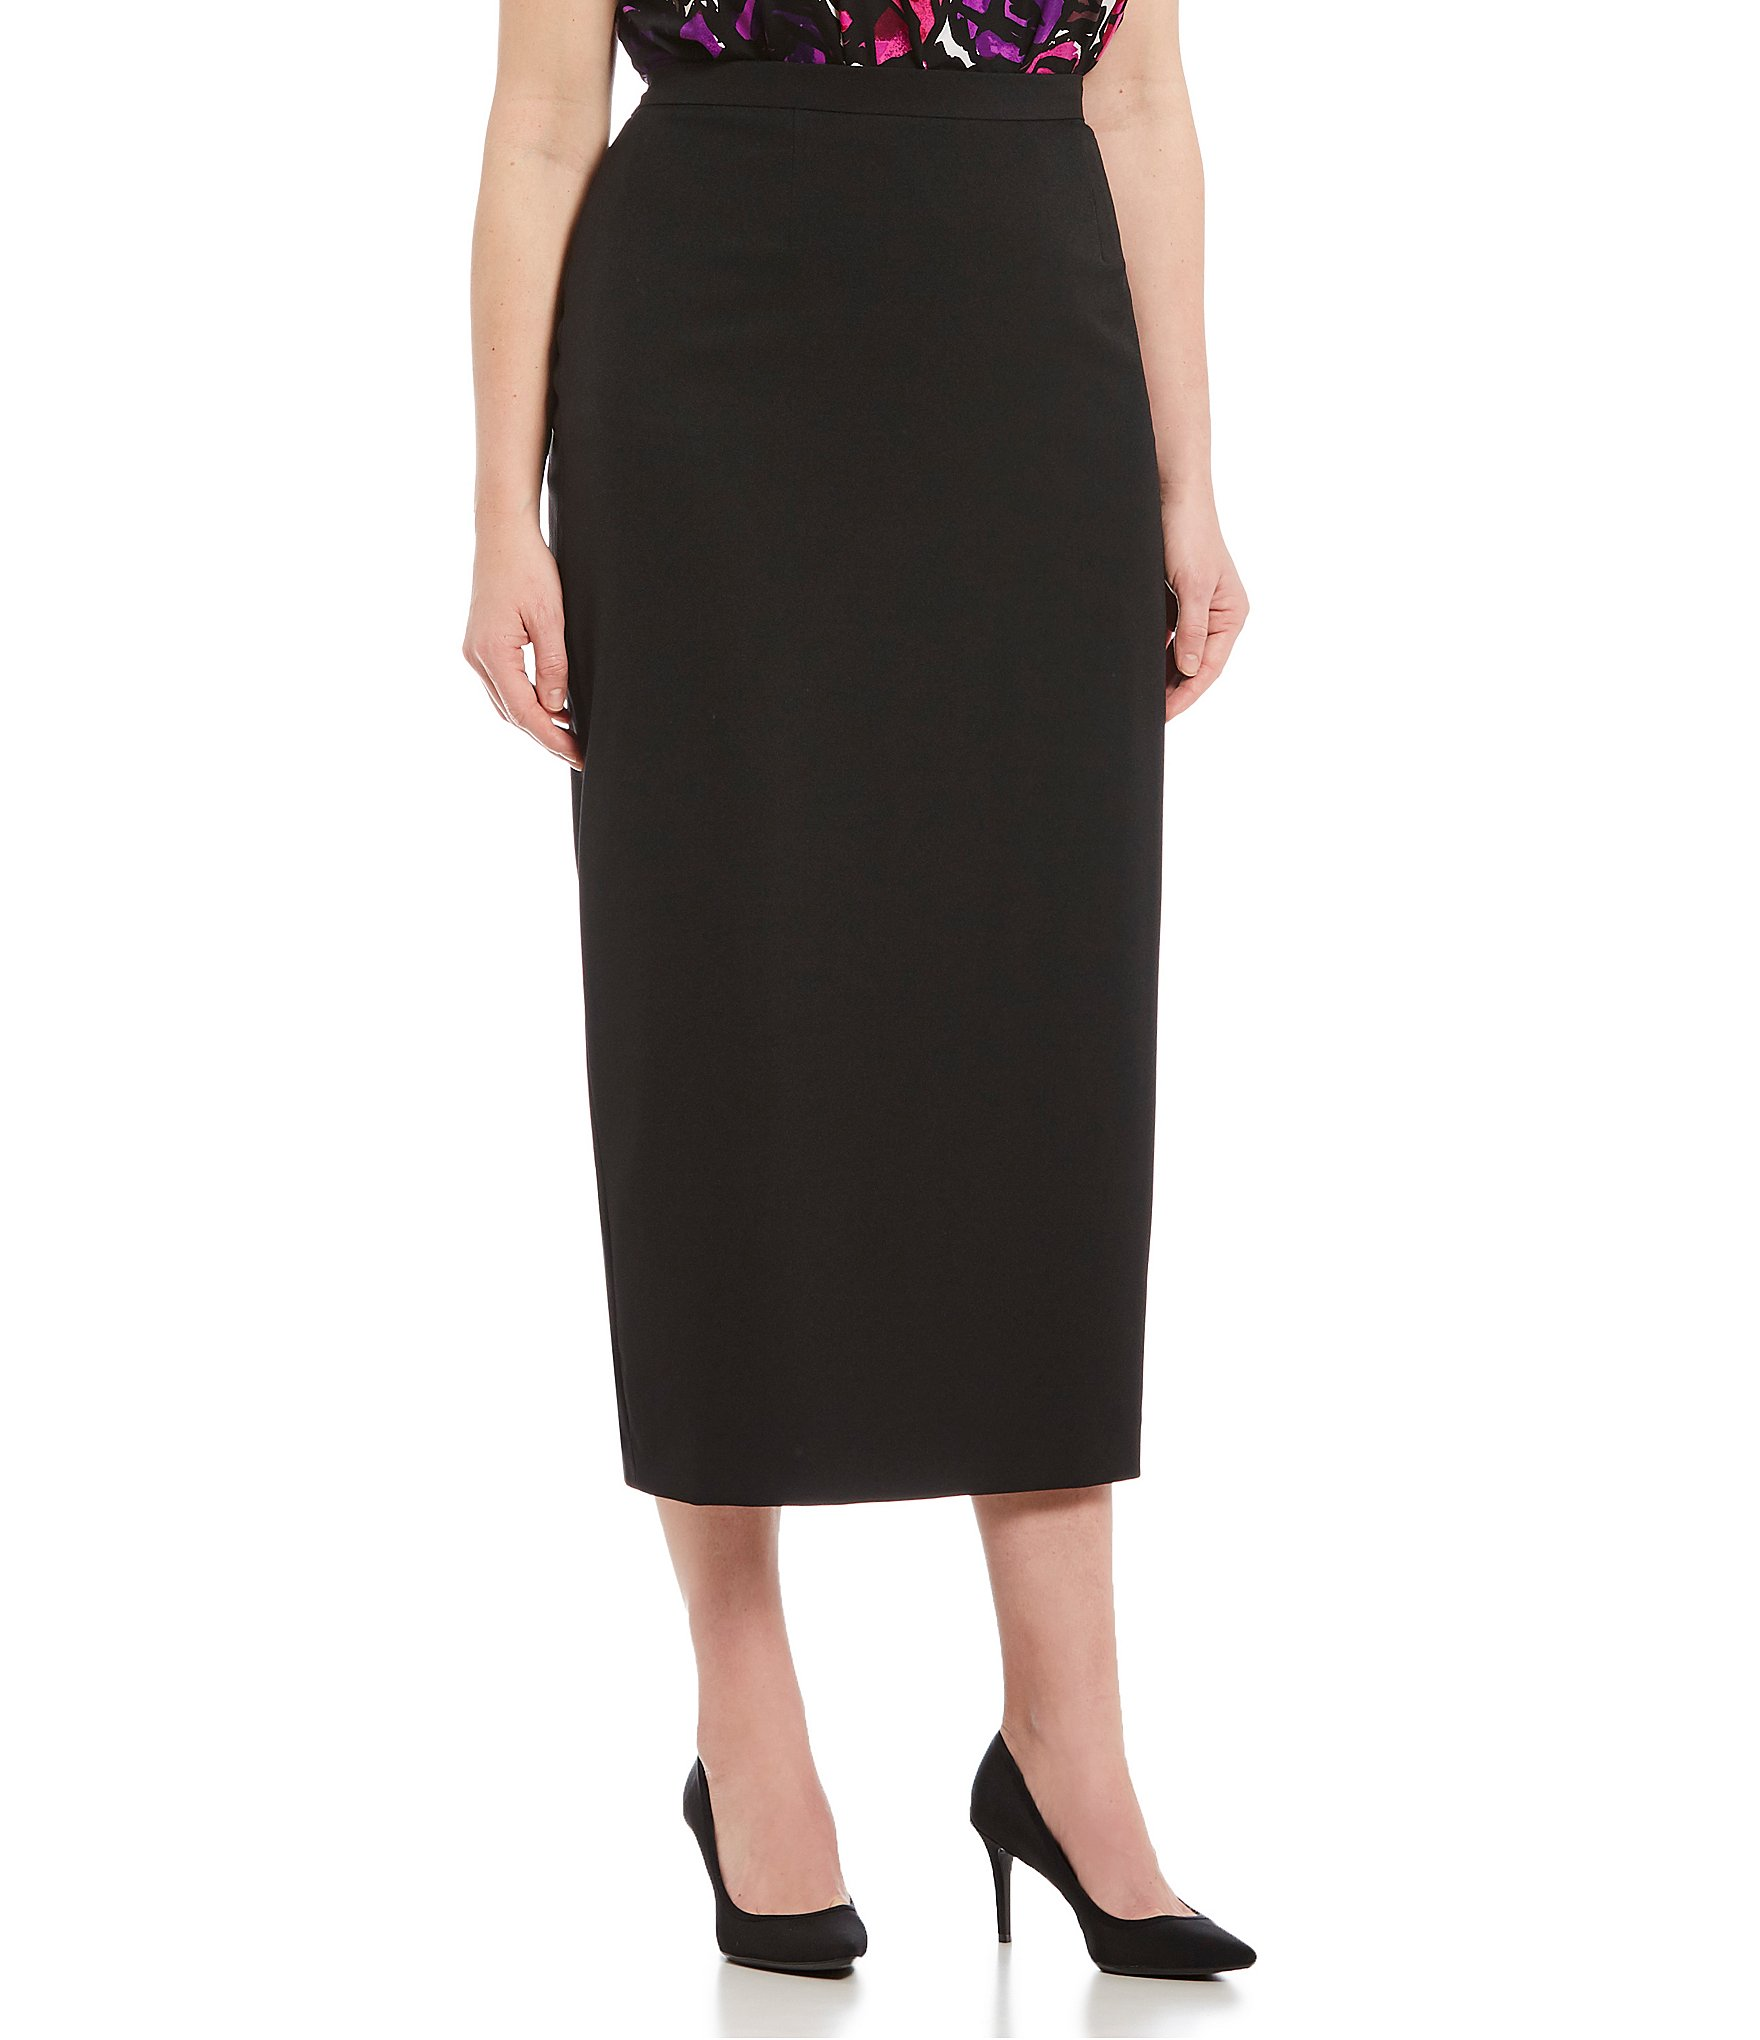 d6f3e2b554 Kasper Plus Size Women's Clothing | Dillard's